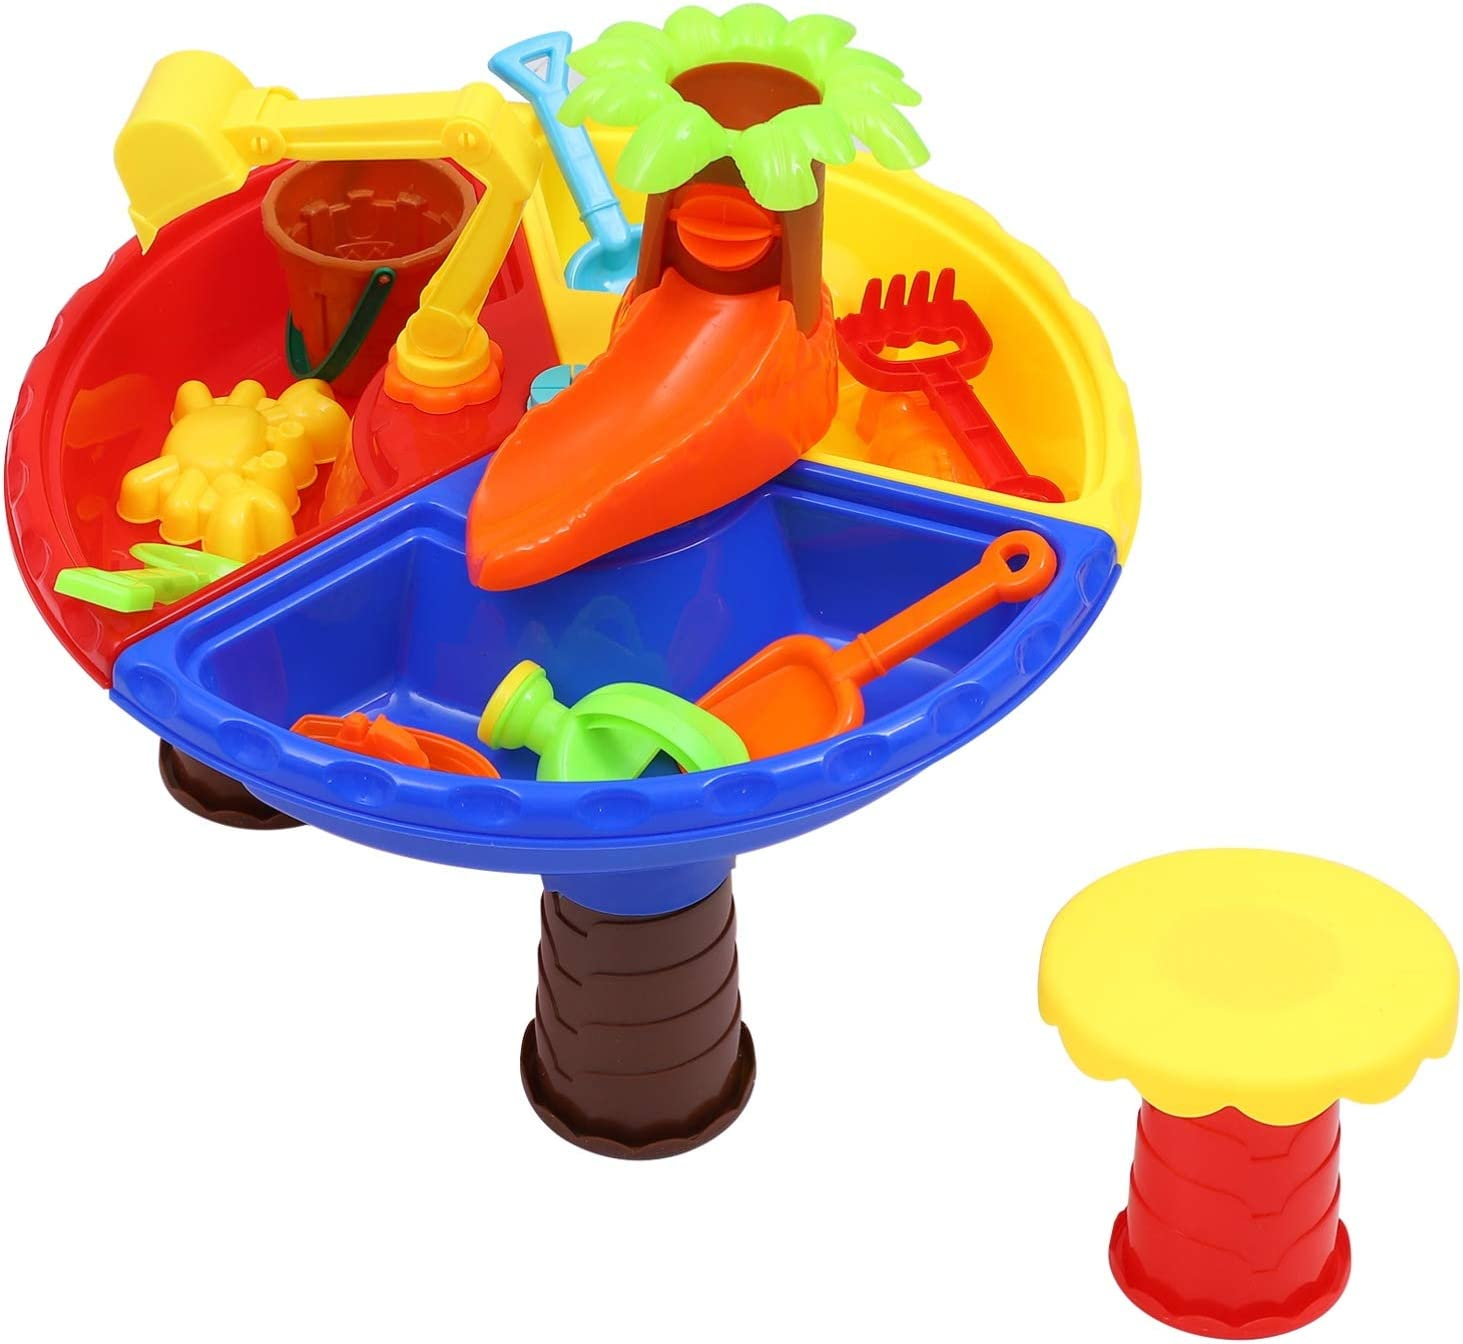 TOYANDONA 1 Set Kids Sand Sandbox New popularity Activity New item Table Water Toddler